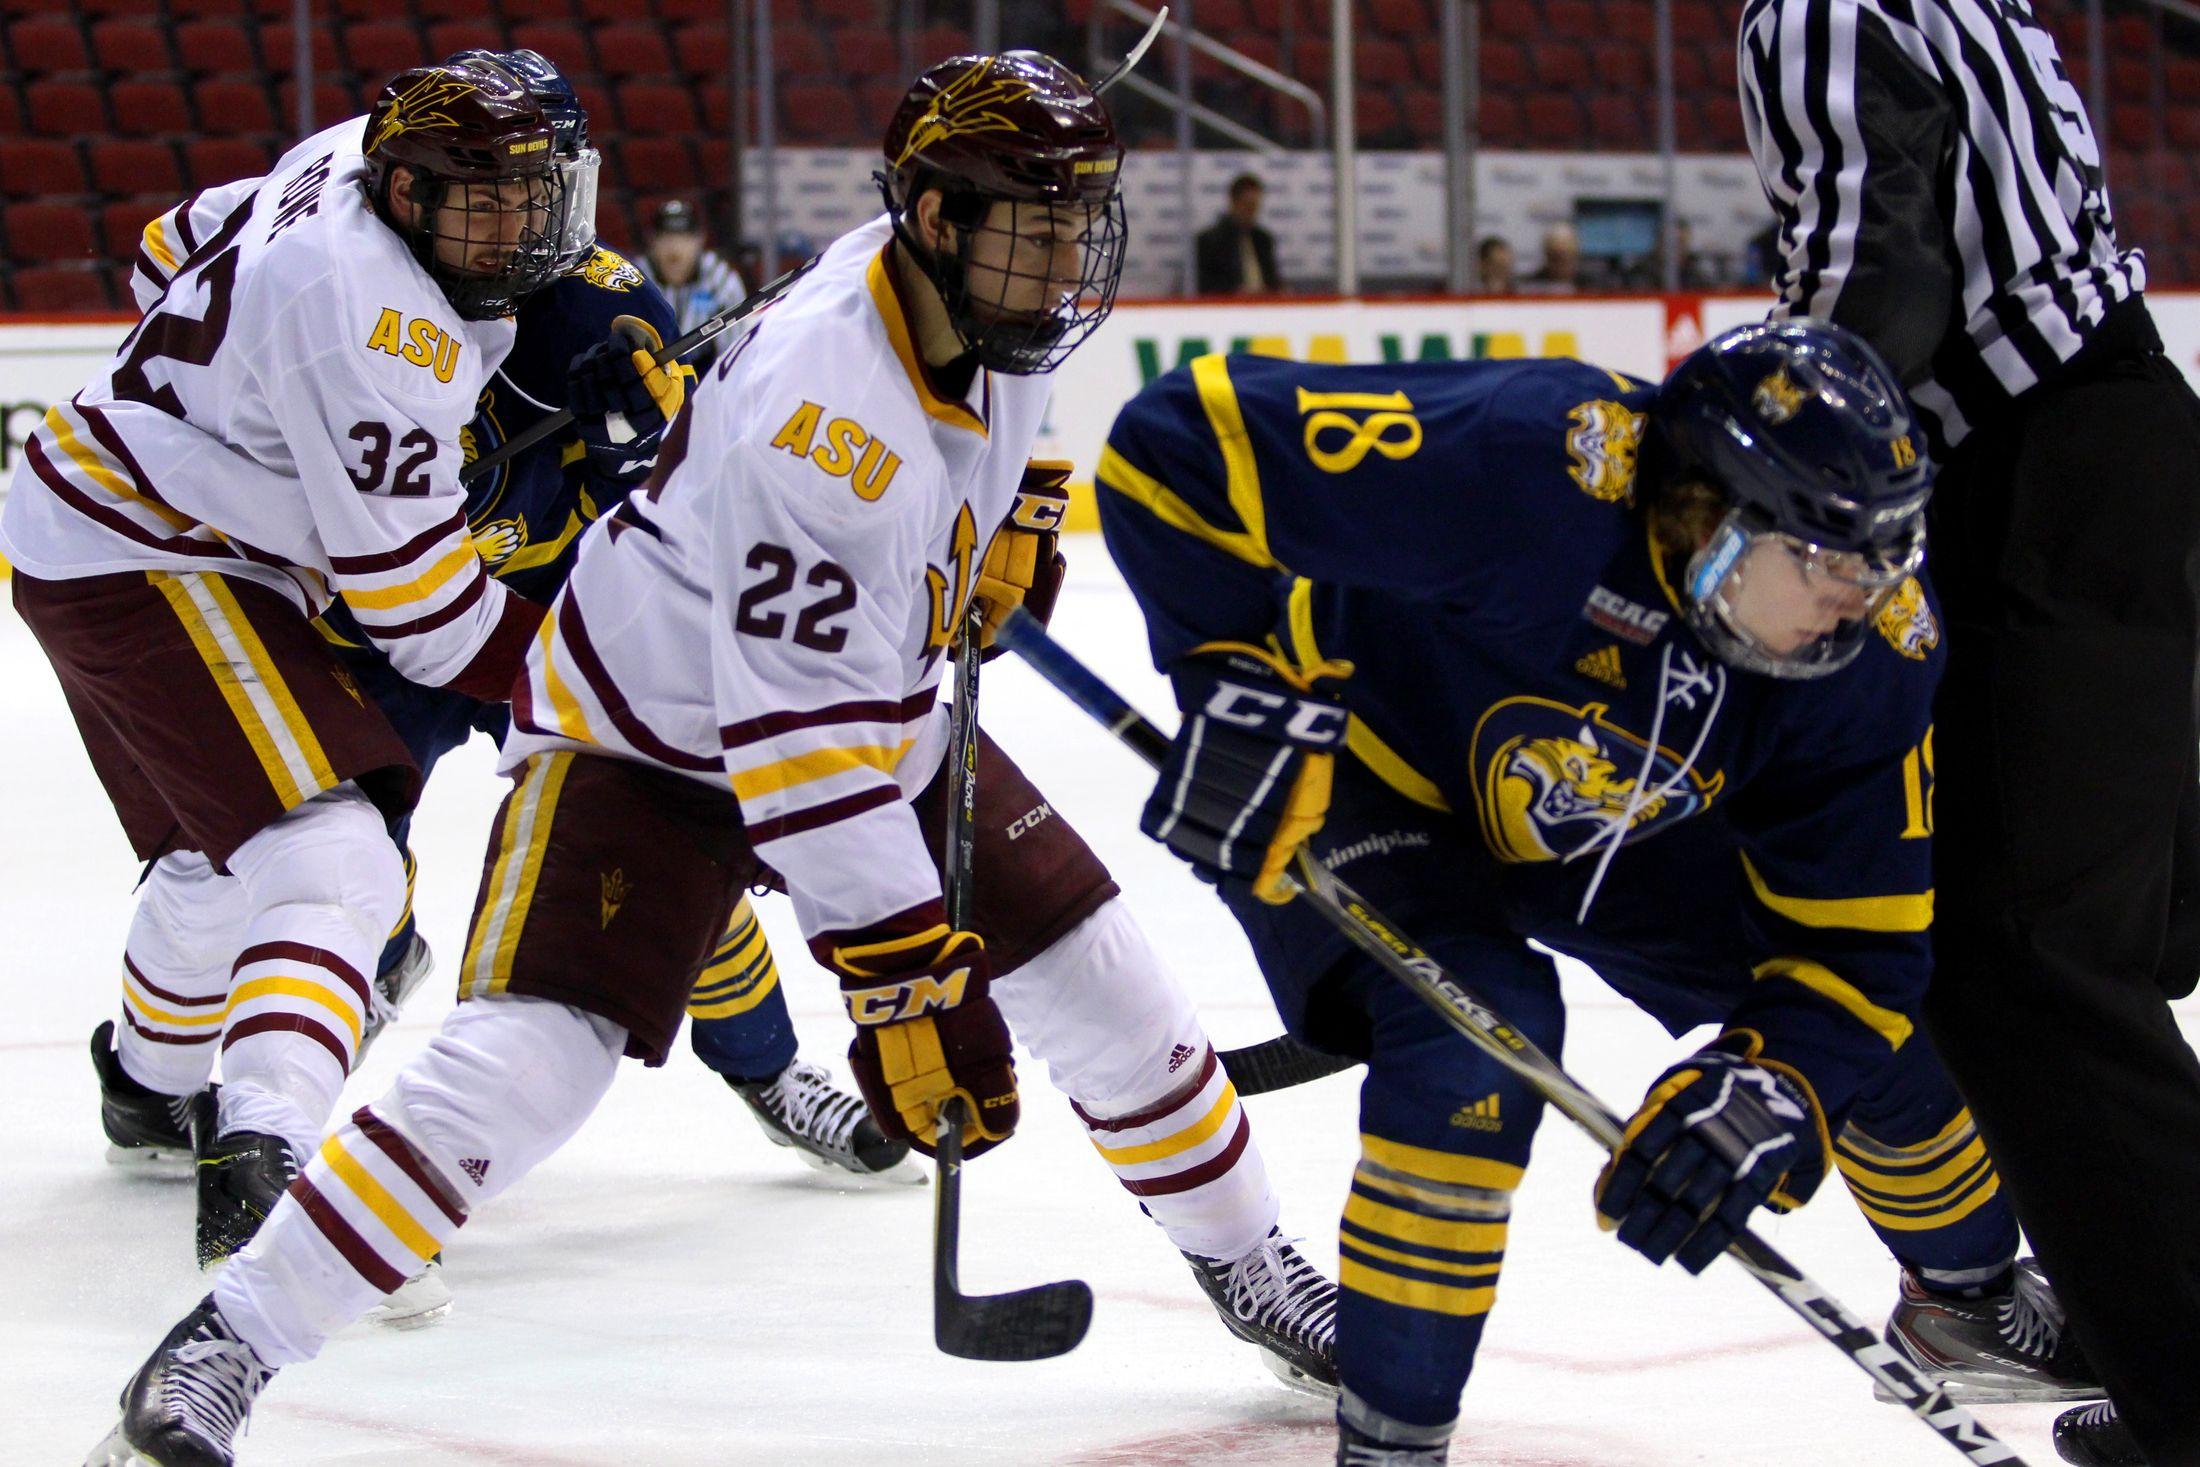 ASU Hockey: Clifford Is Creating Memories, Embracing Senior Season